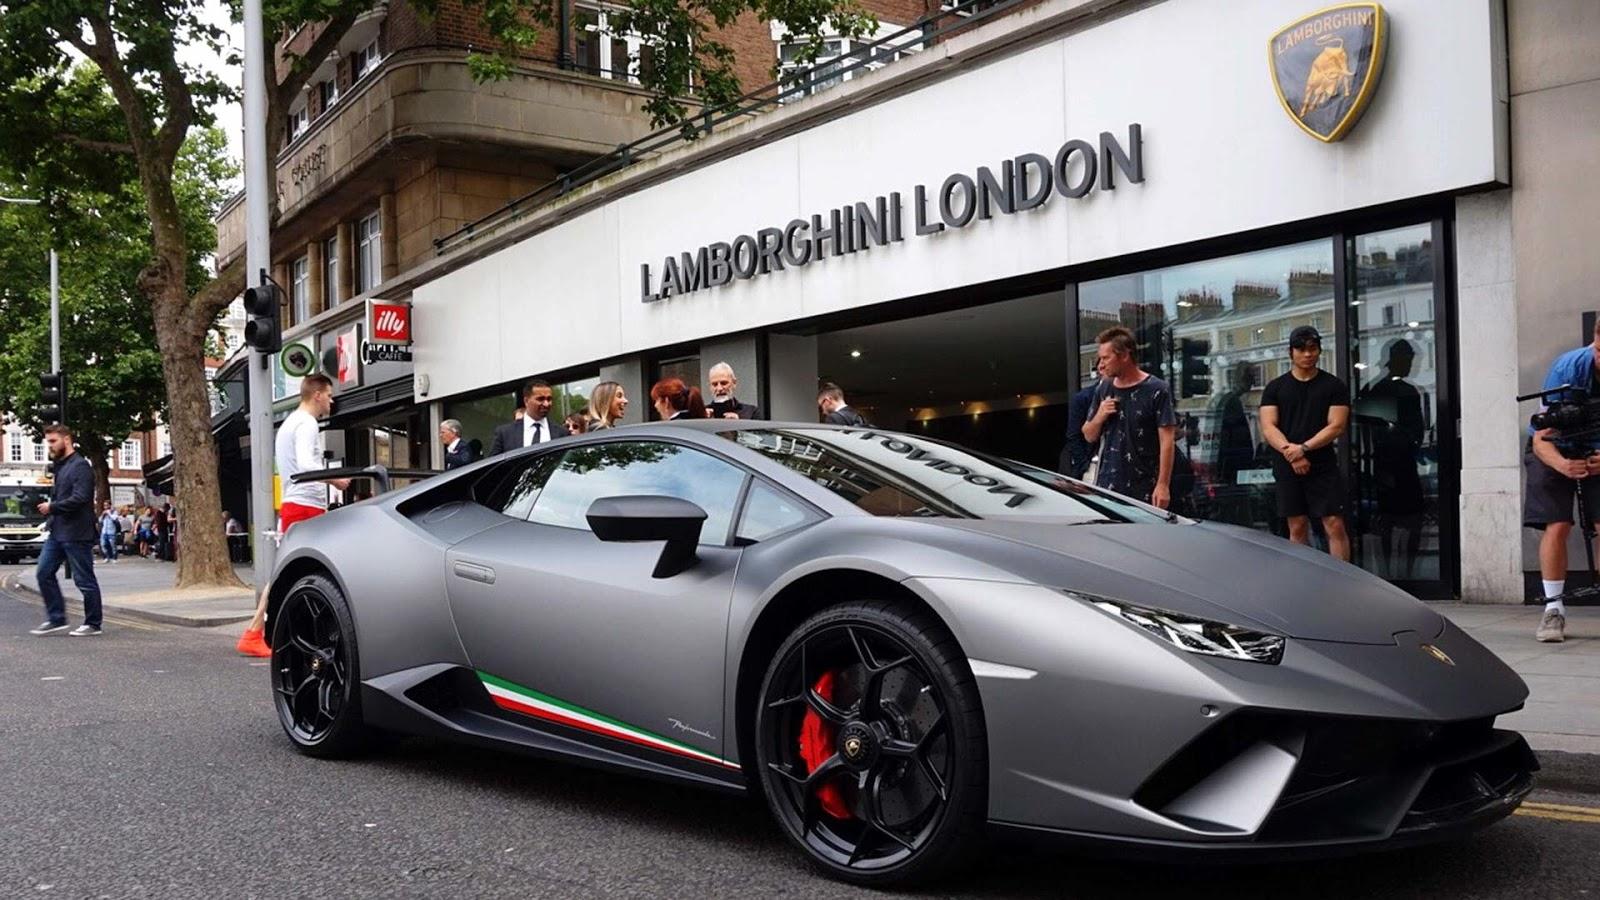 carshighlight - cars review, concept, specs, price: lamborghini